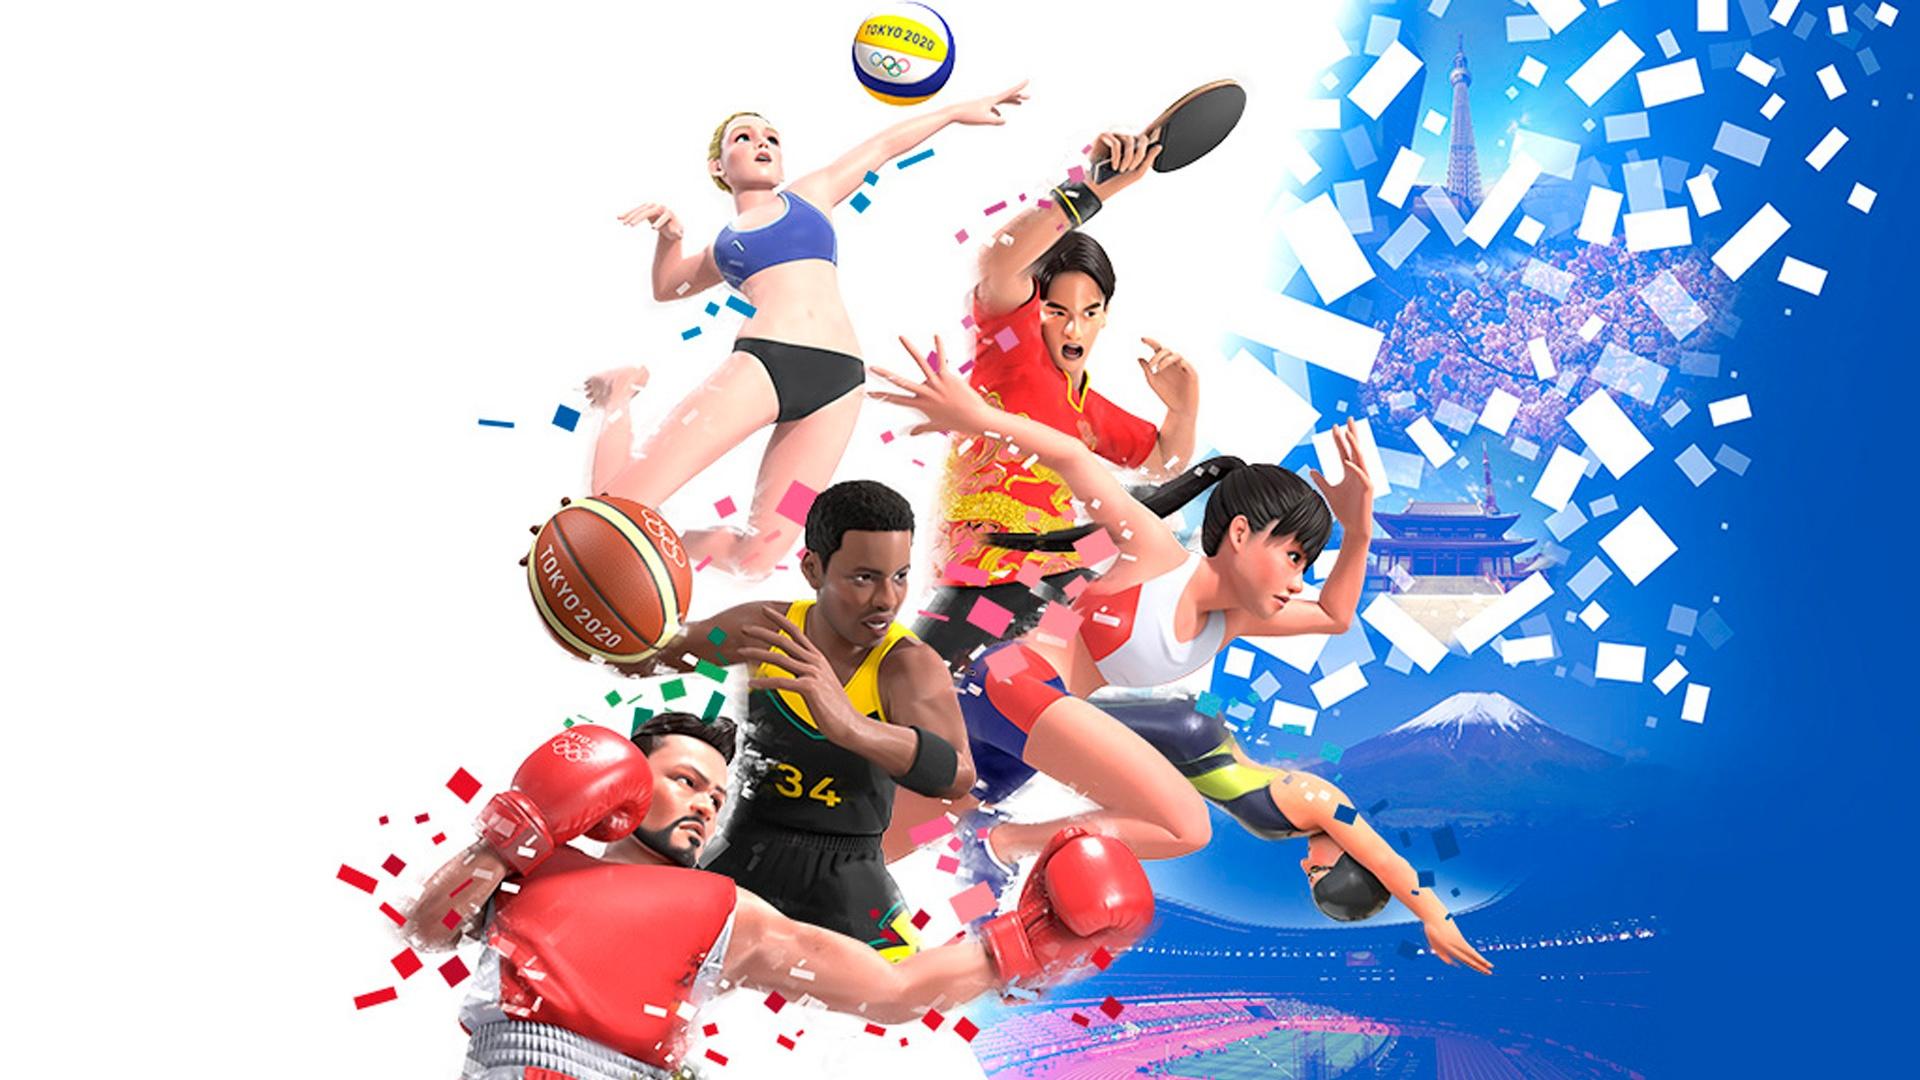 Tokyo 2020 Olympics 1080p wallpaper